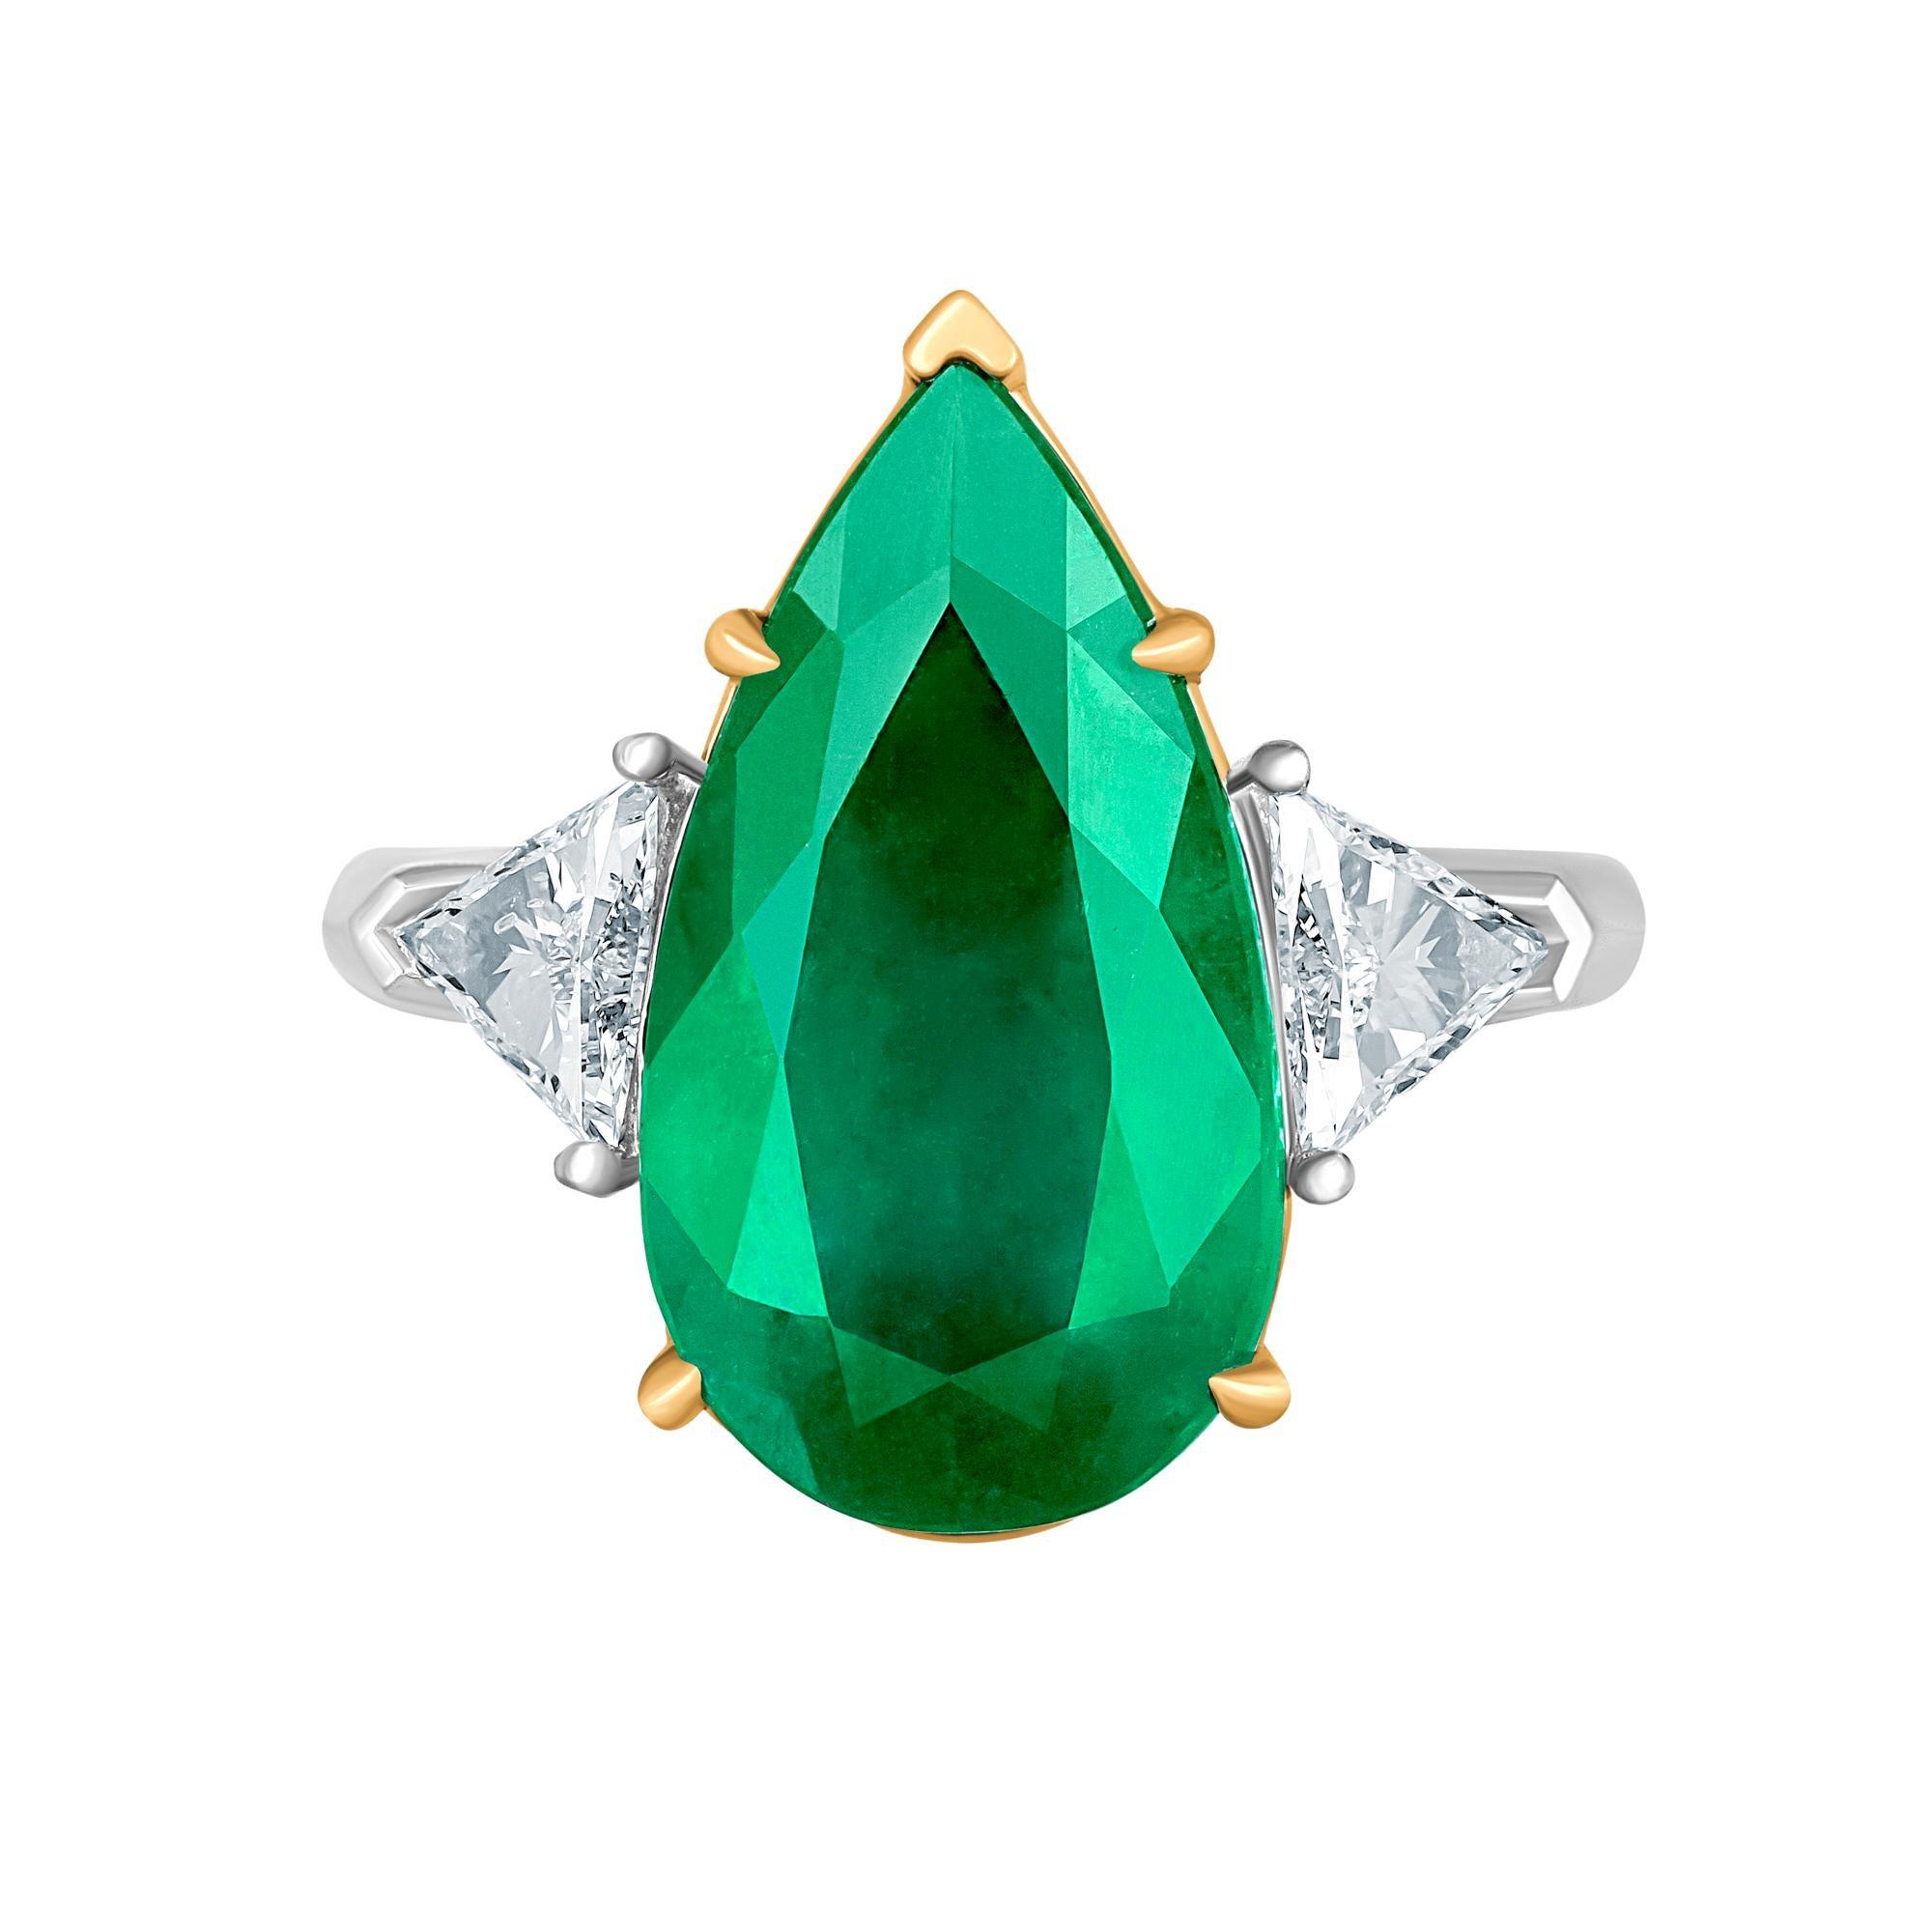 Emilio Jewelry 6.98 Carat Colombian Emerald Diamond Ring